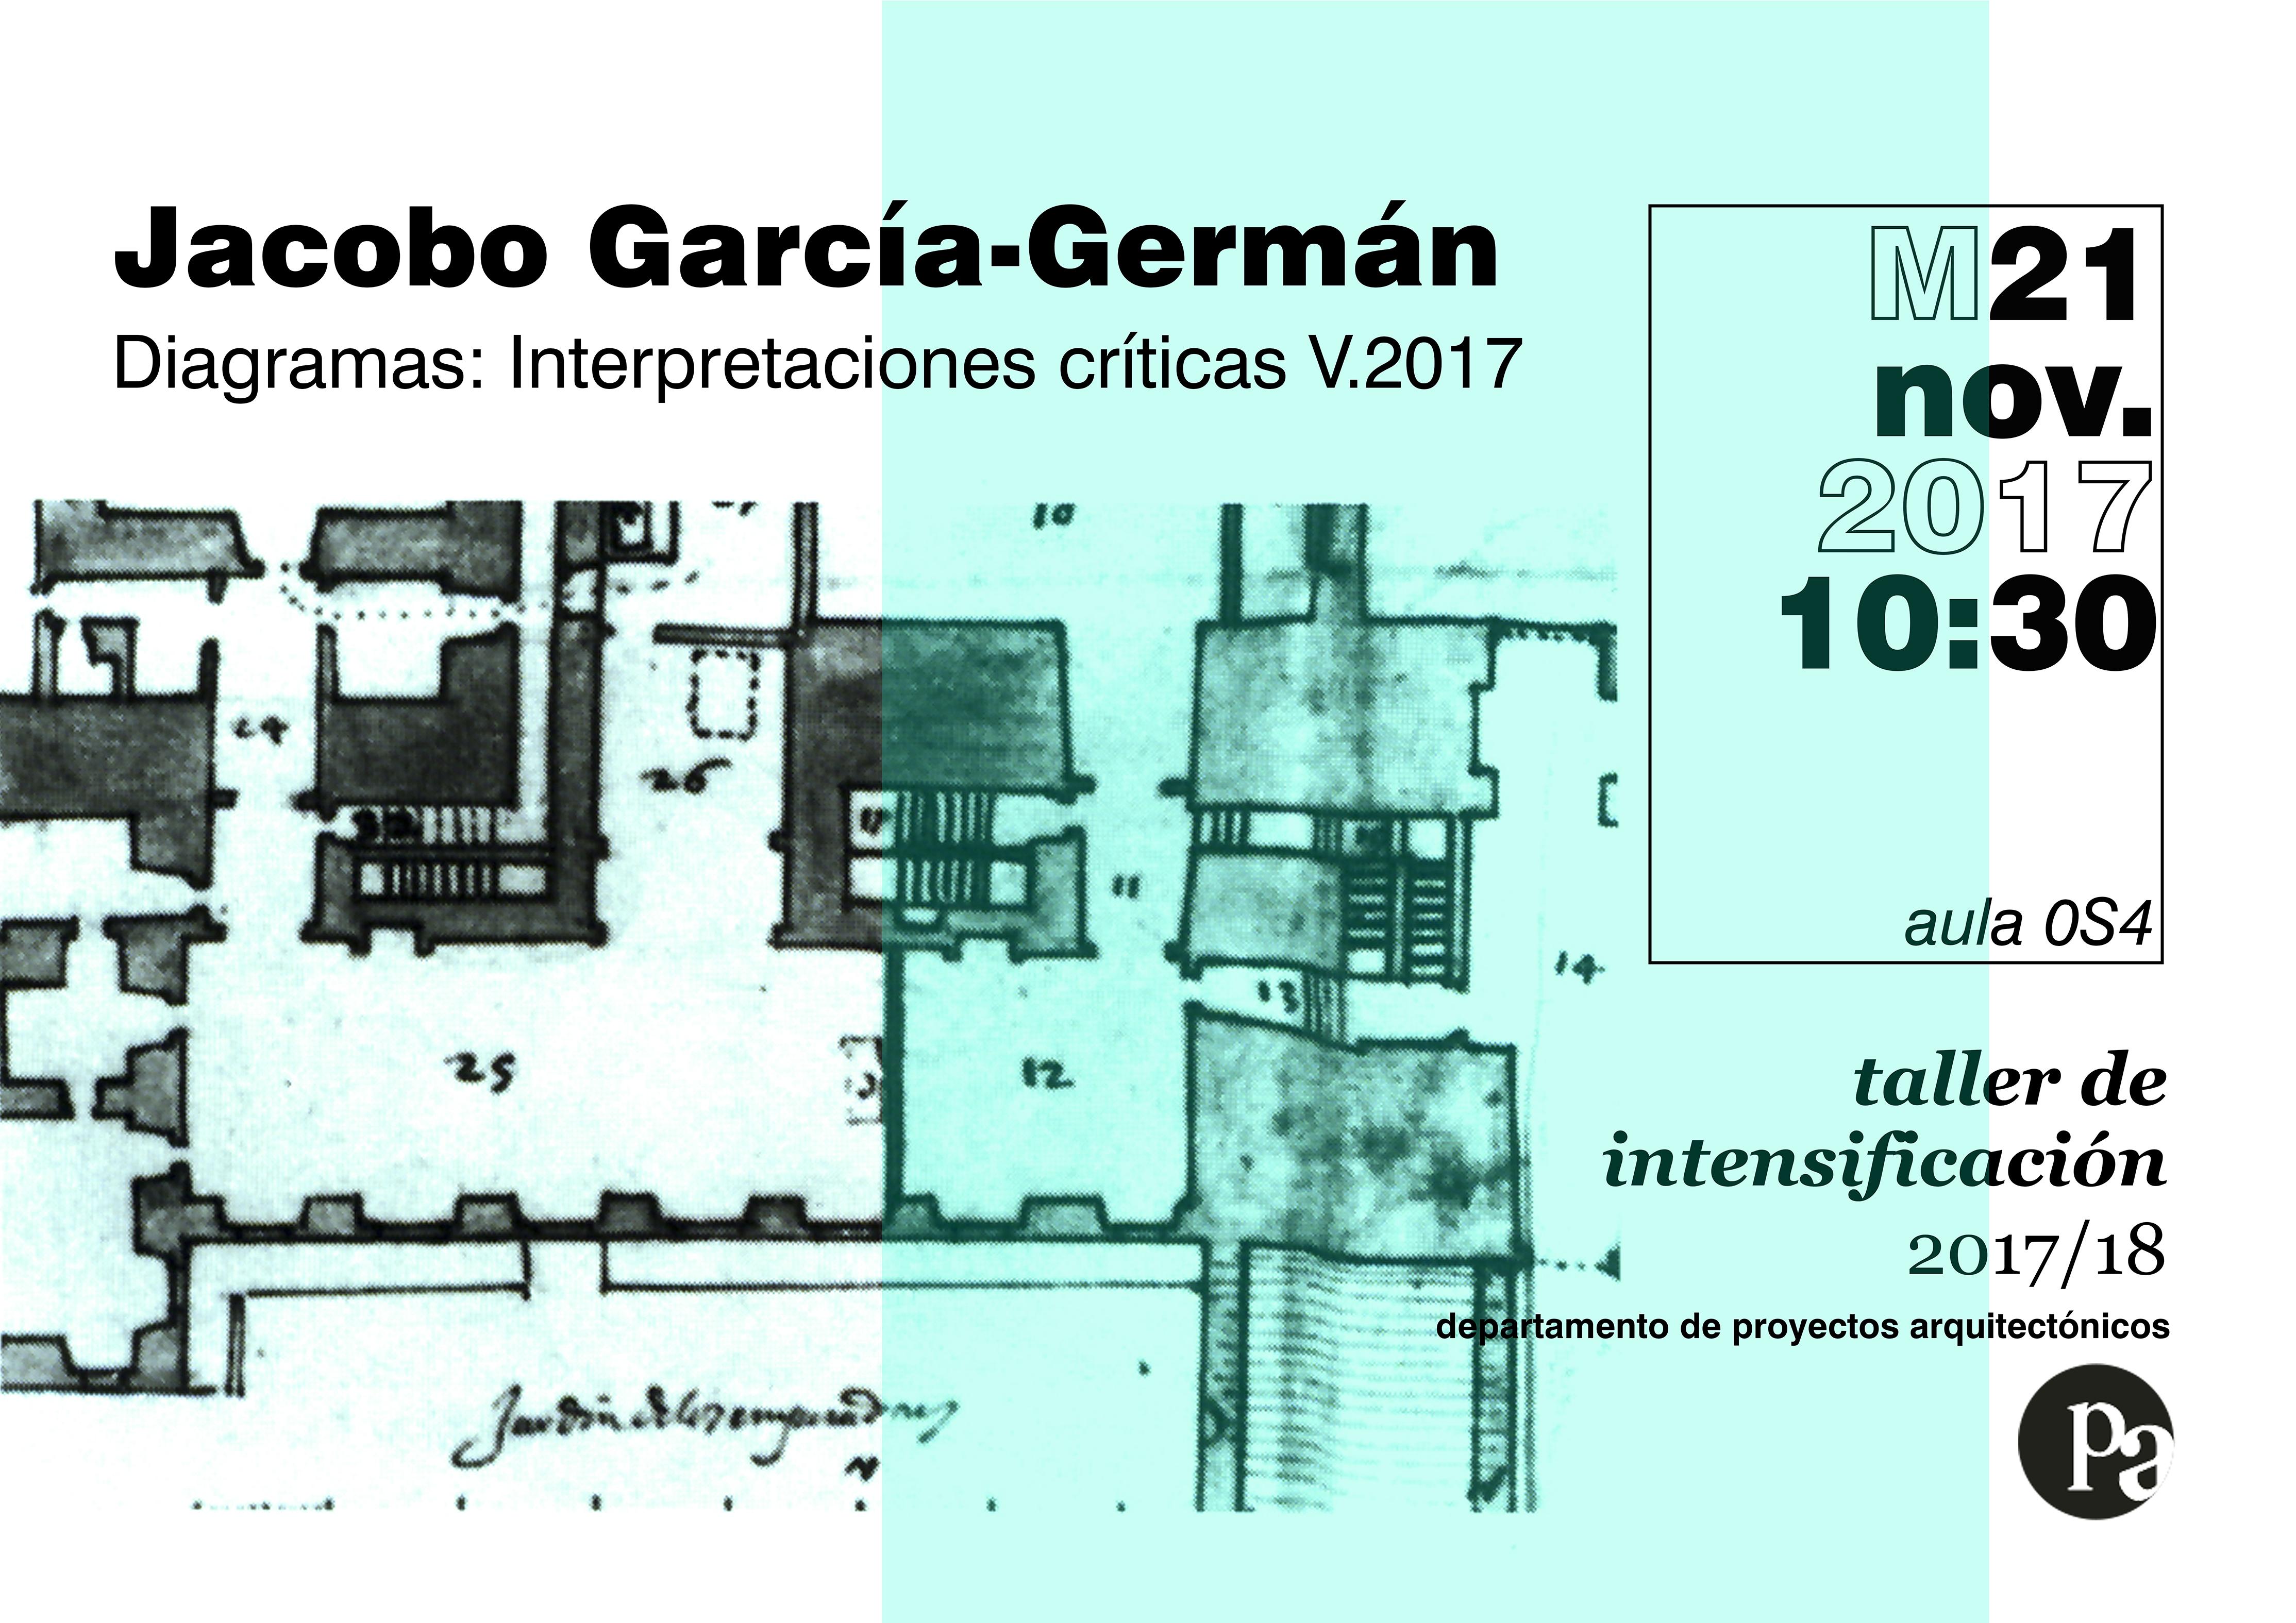 cartel jacobog-german